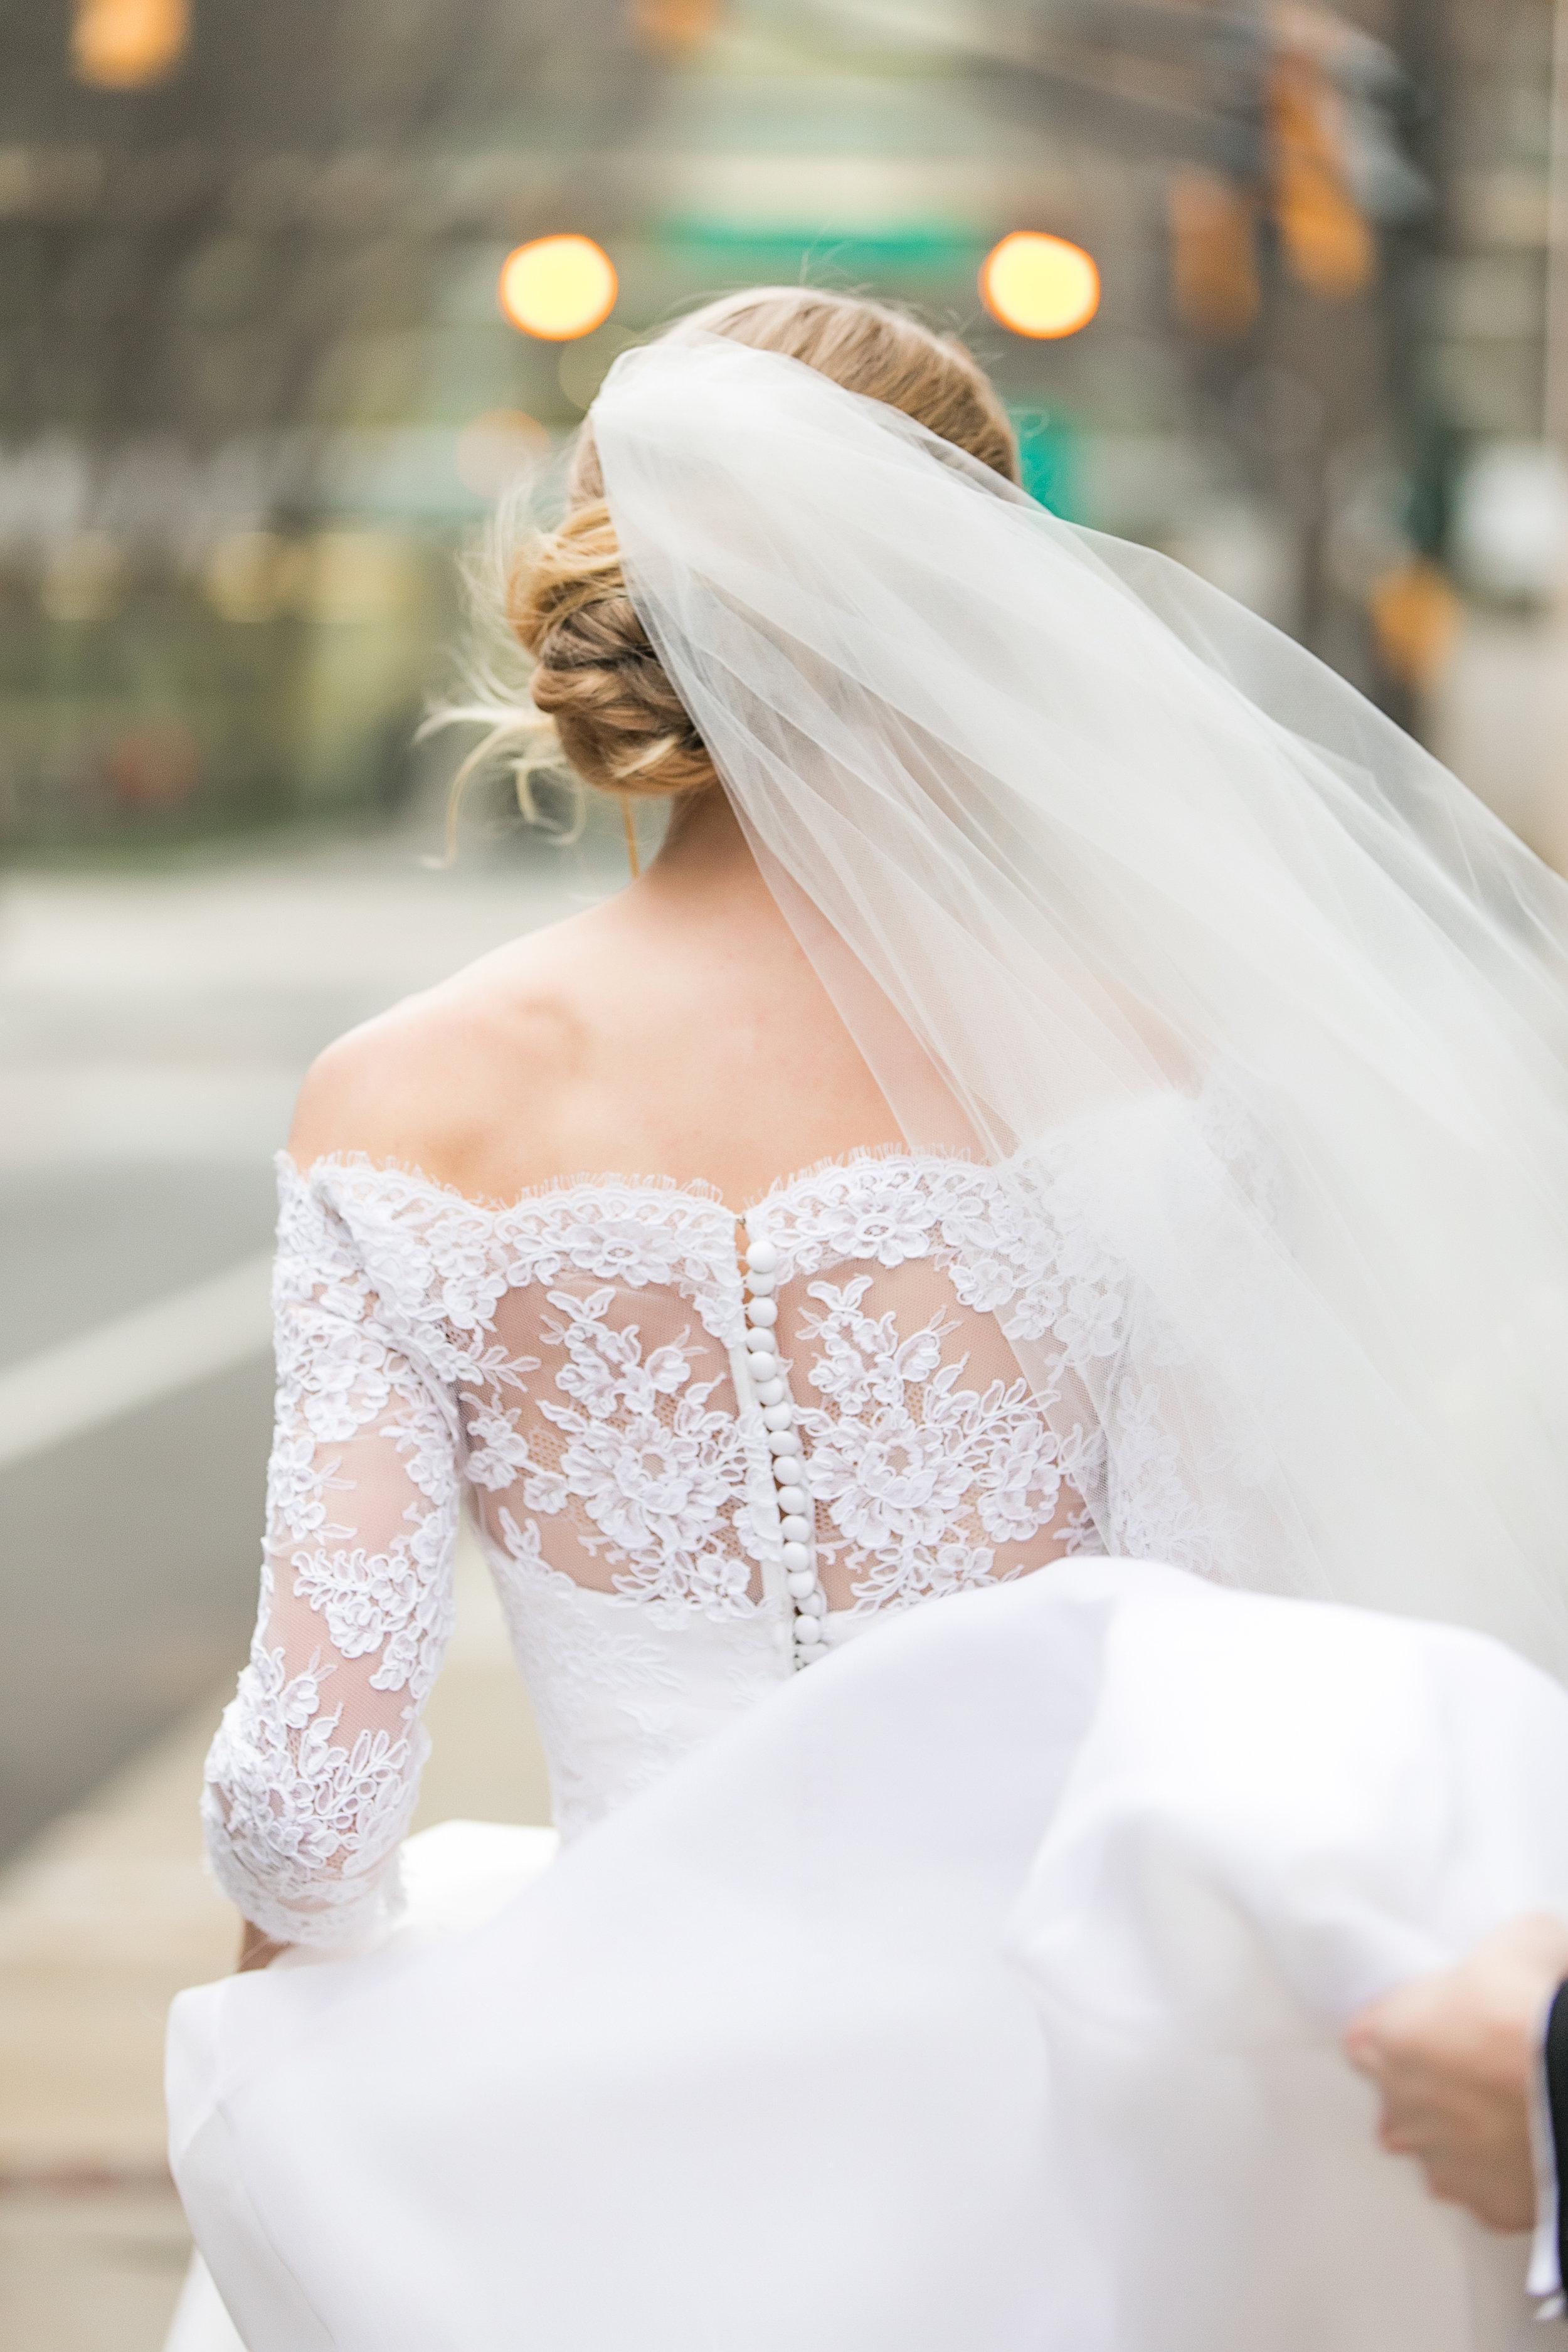 Biltmore Ballrooms Atlanta Wedding Planner Slauer Events 38.jpg